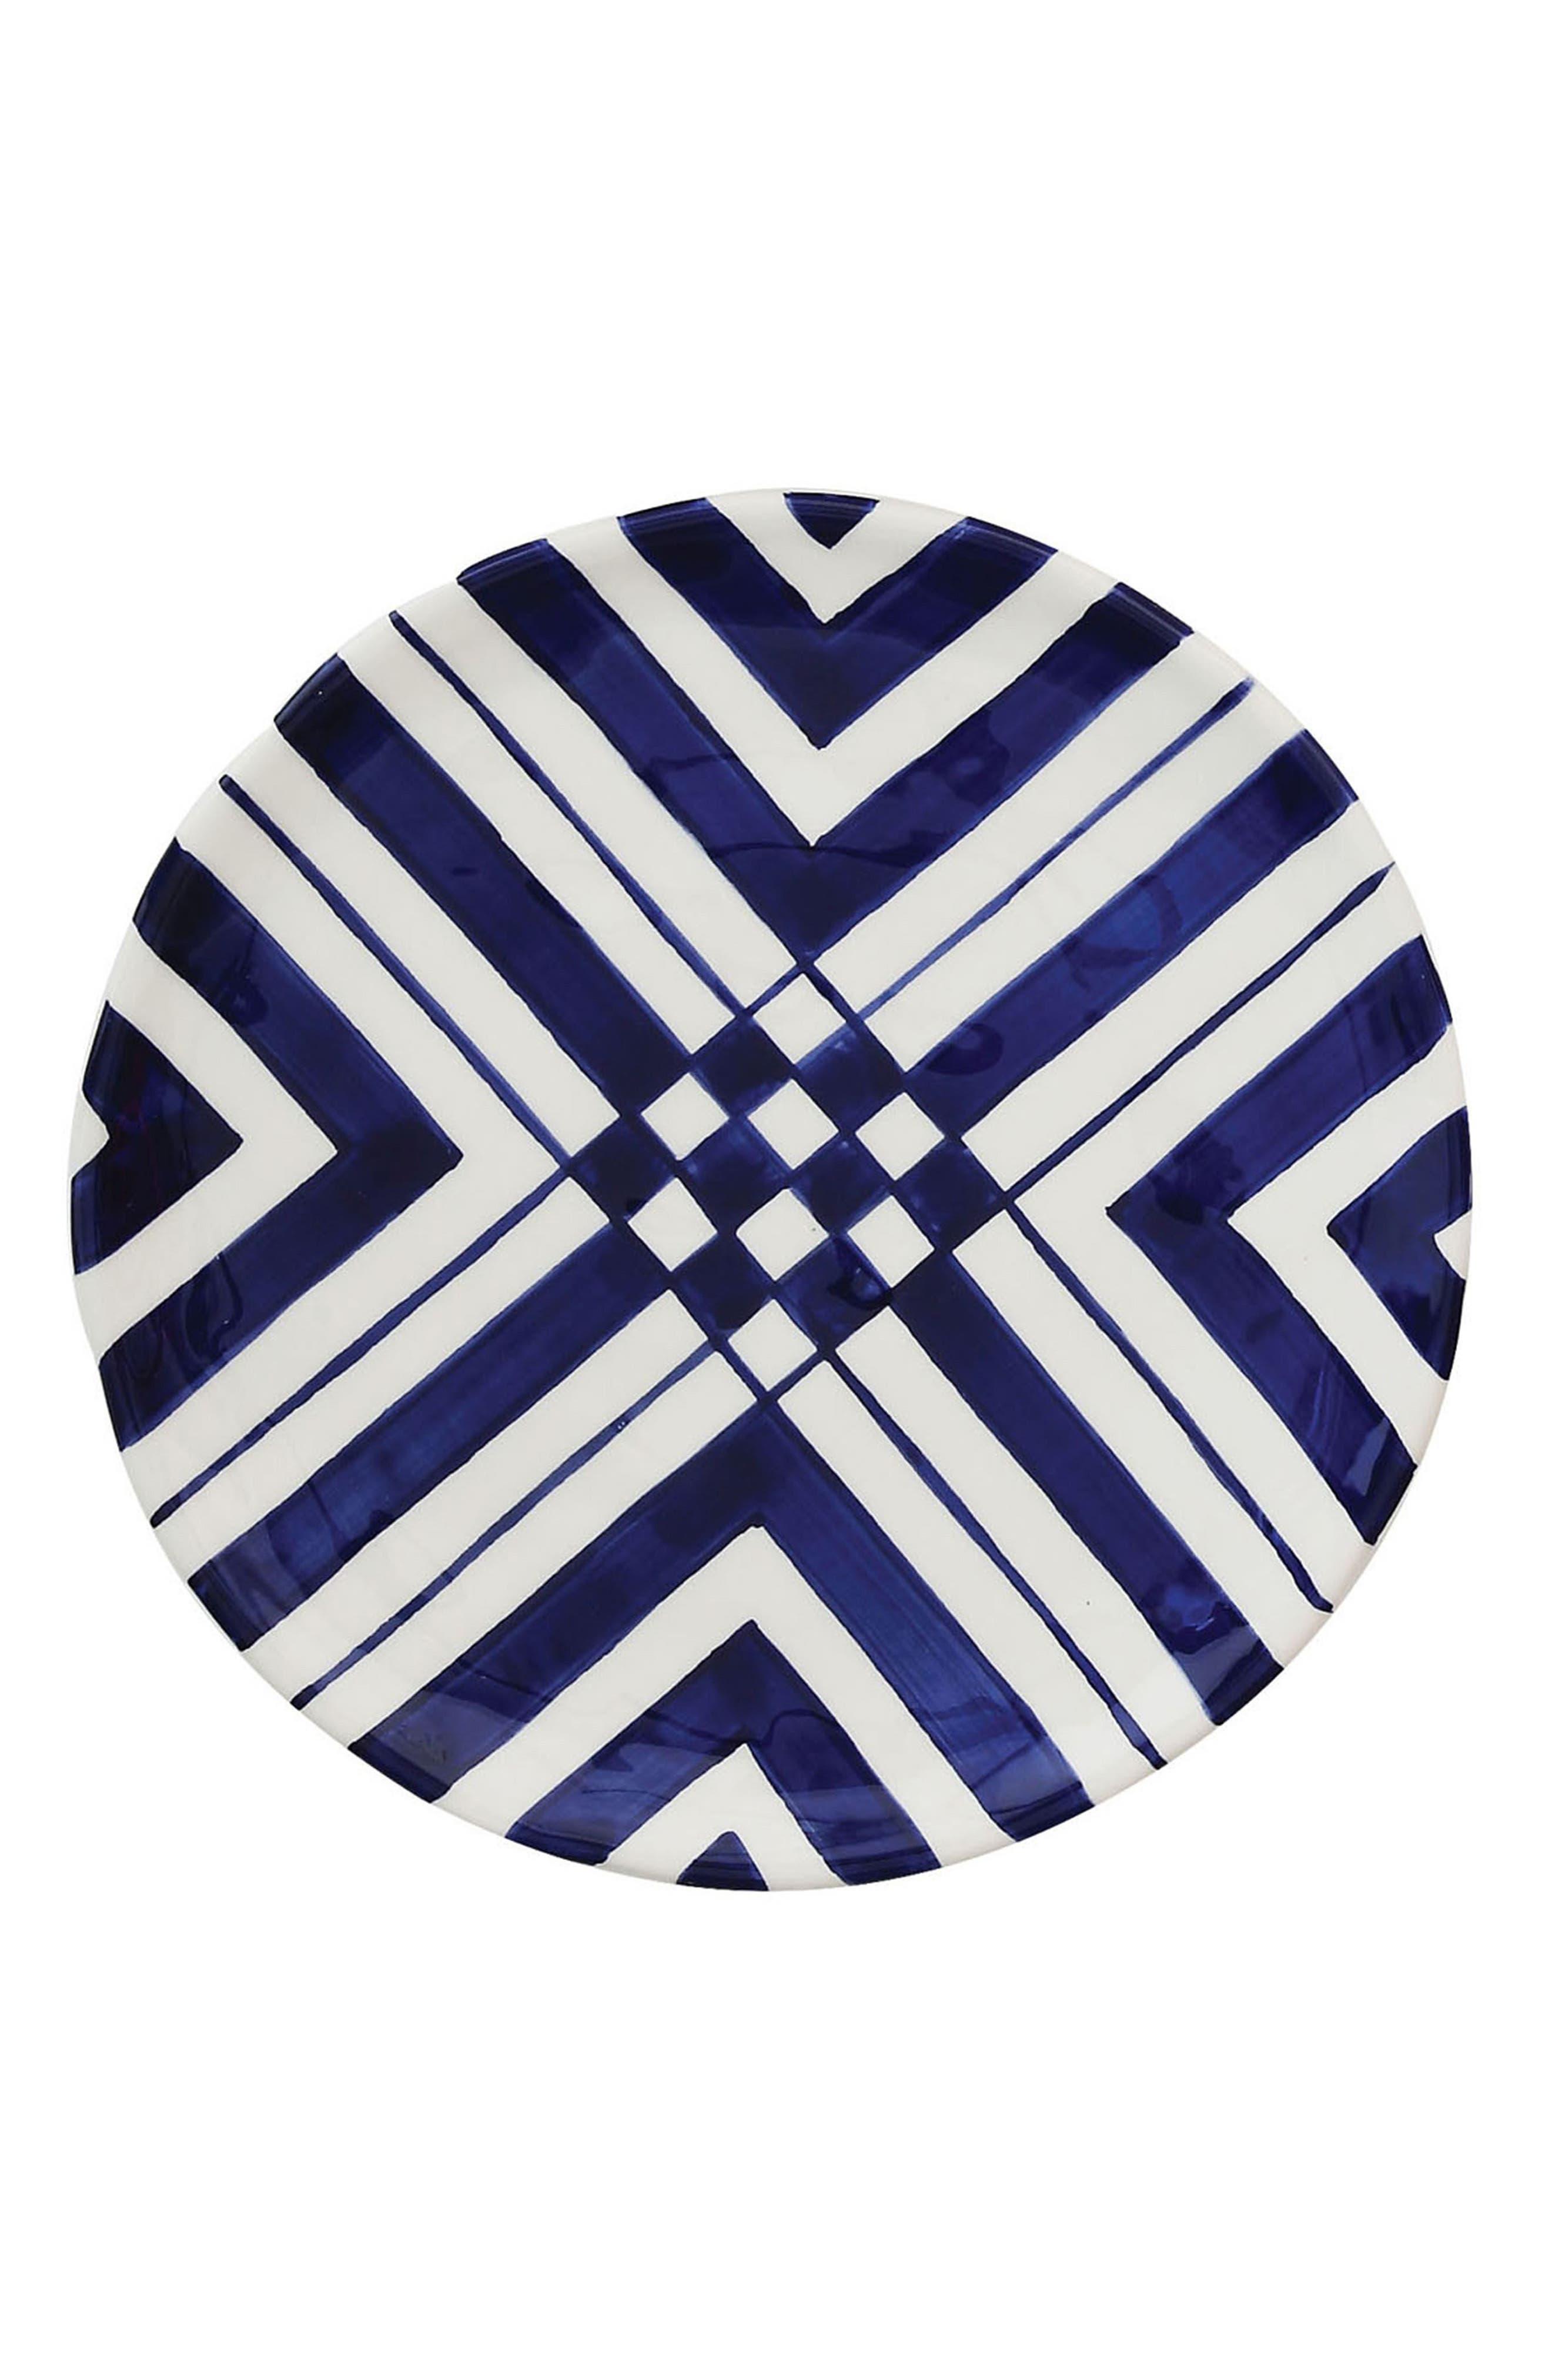 Creative Co-Op Blue & White Plate